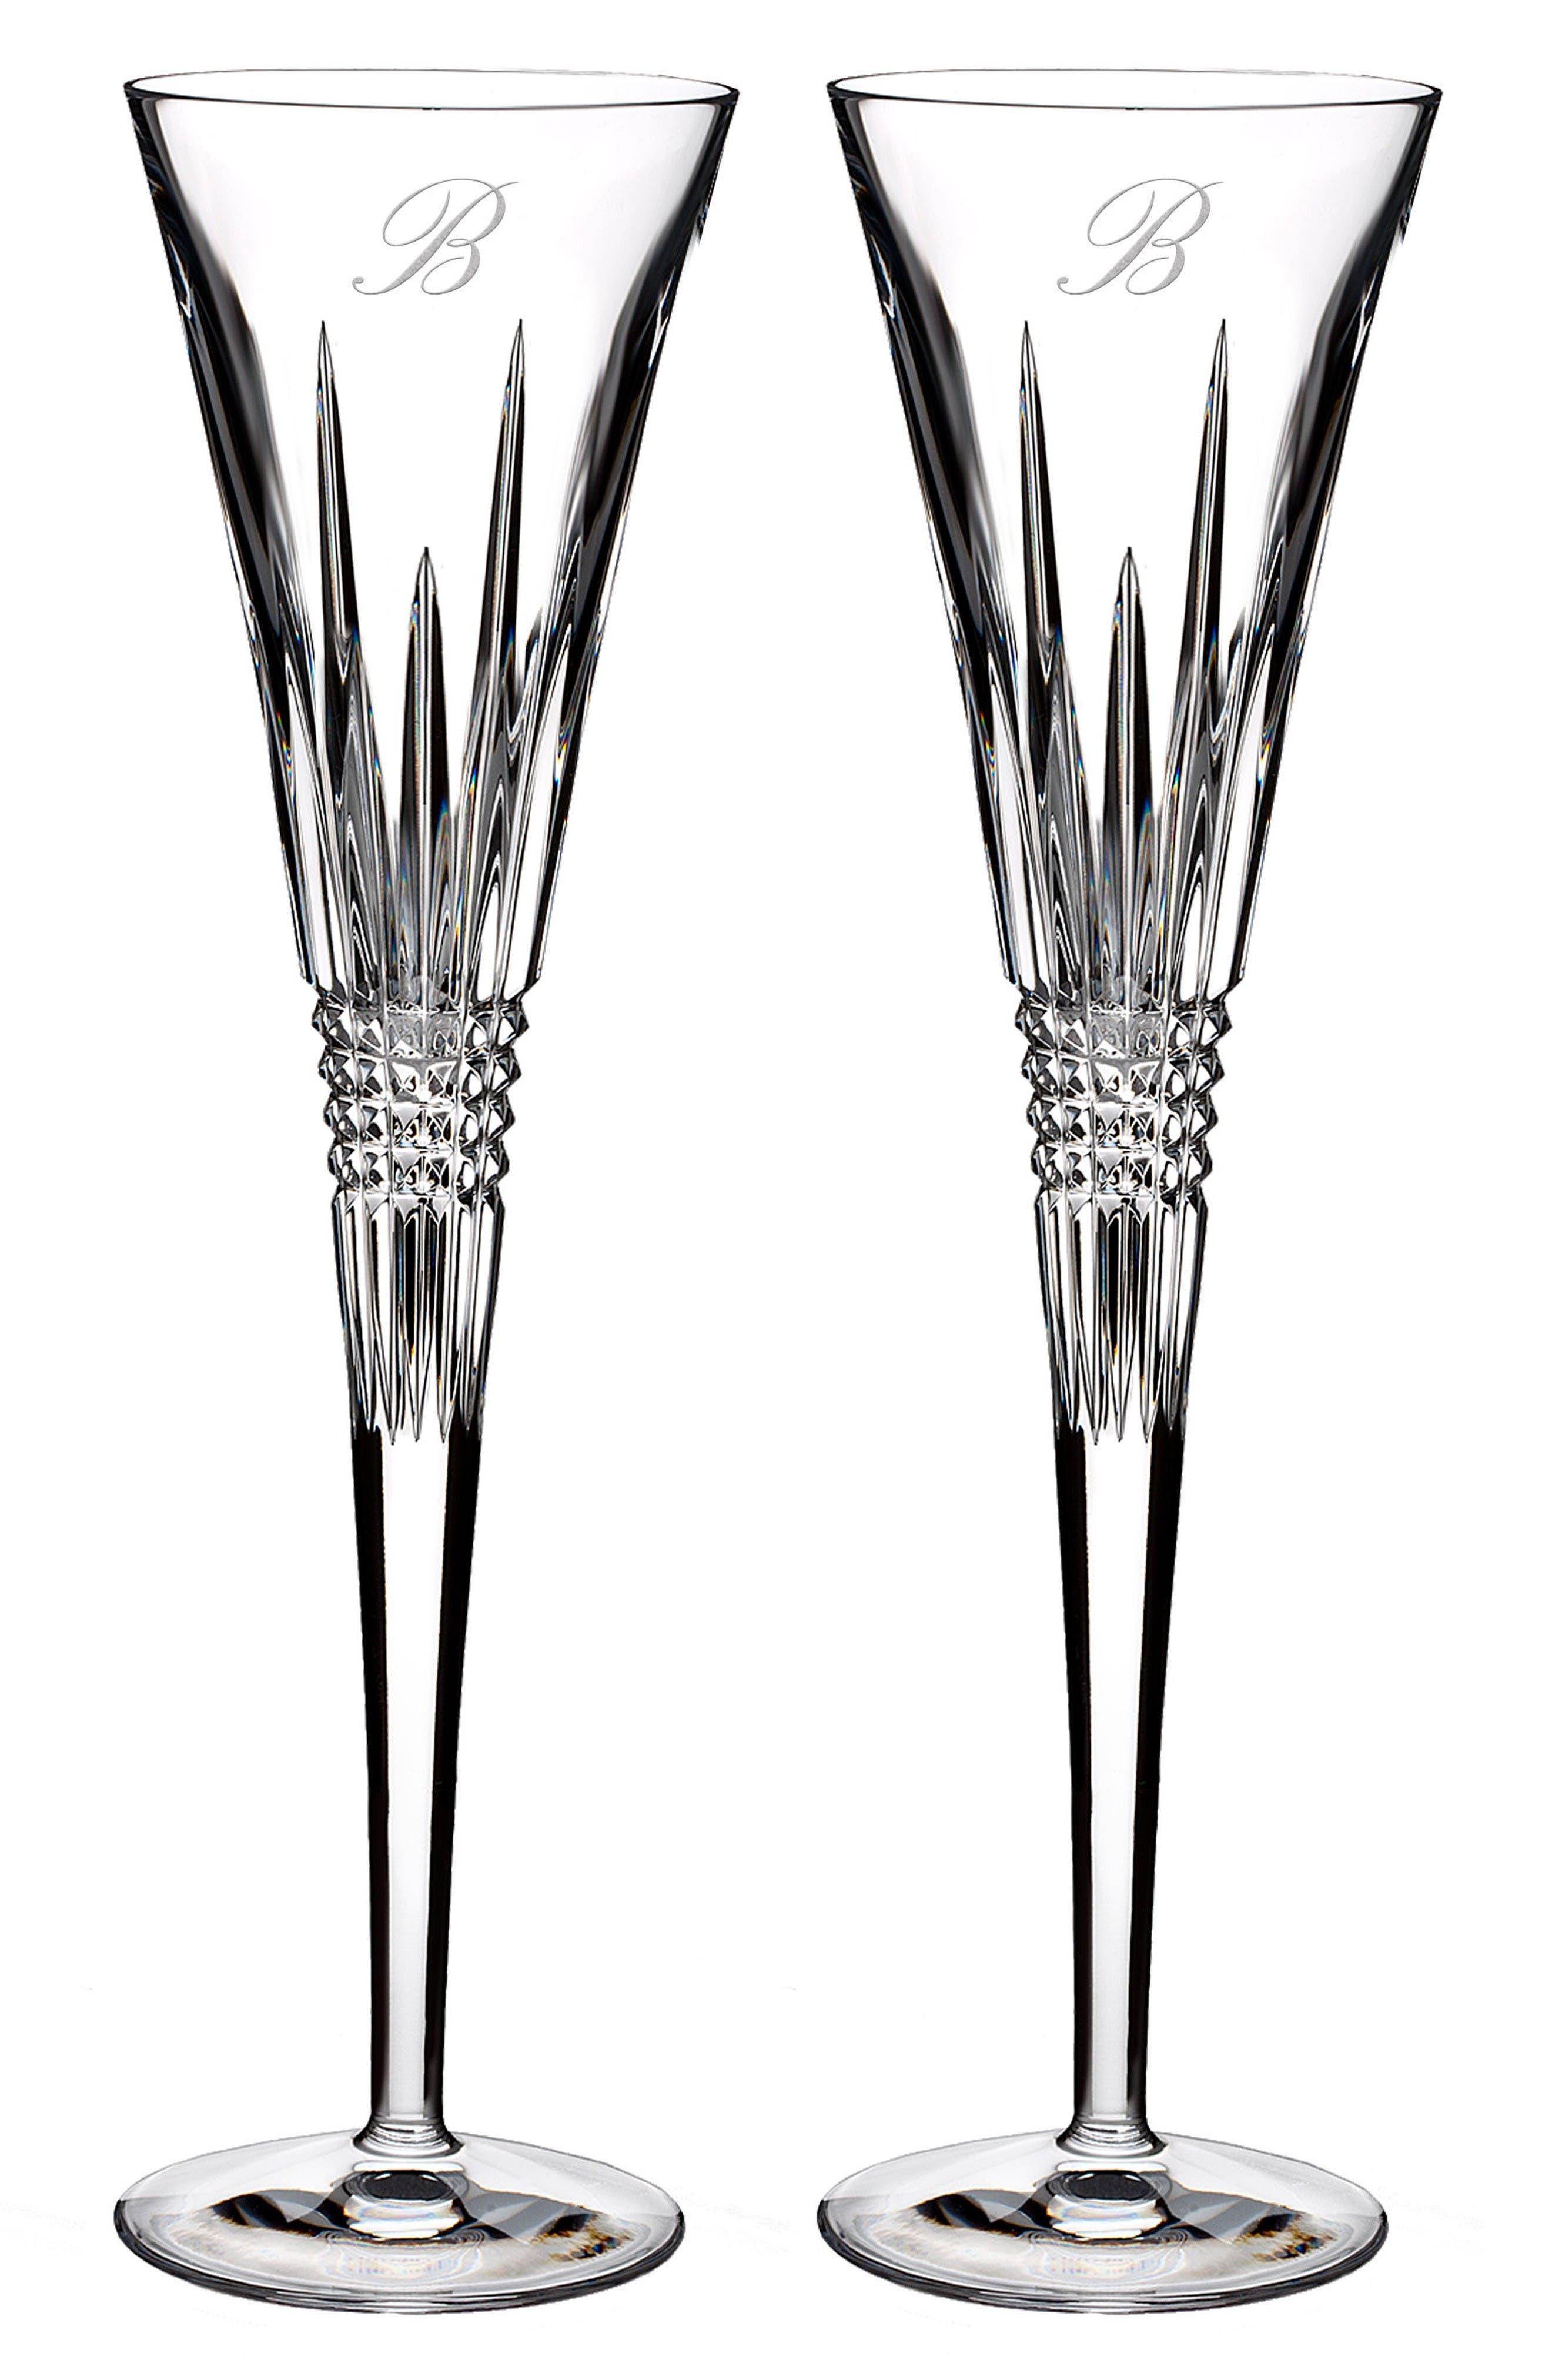 Waterford Lismore Diamond Set of 2 Monogram Lead Crystal Champagne Flutes